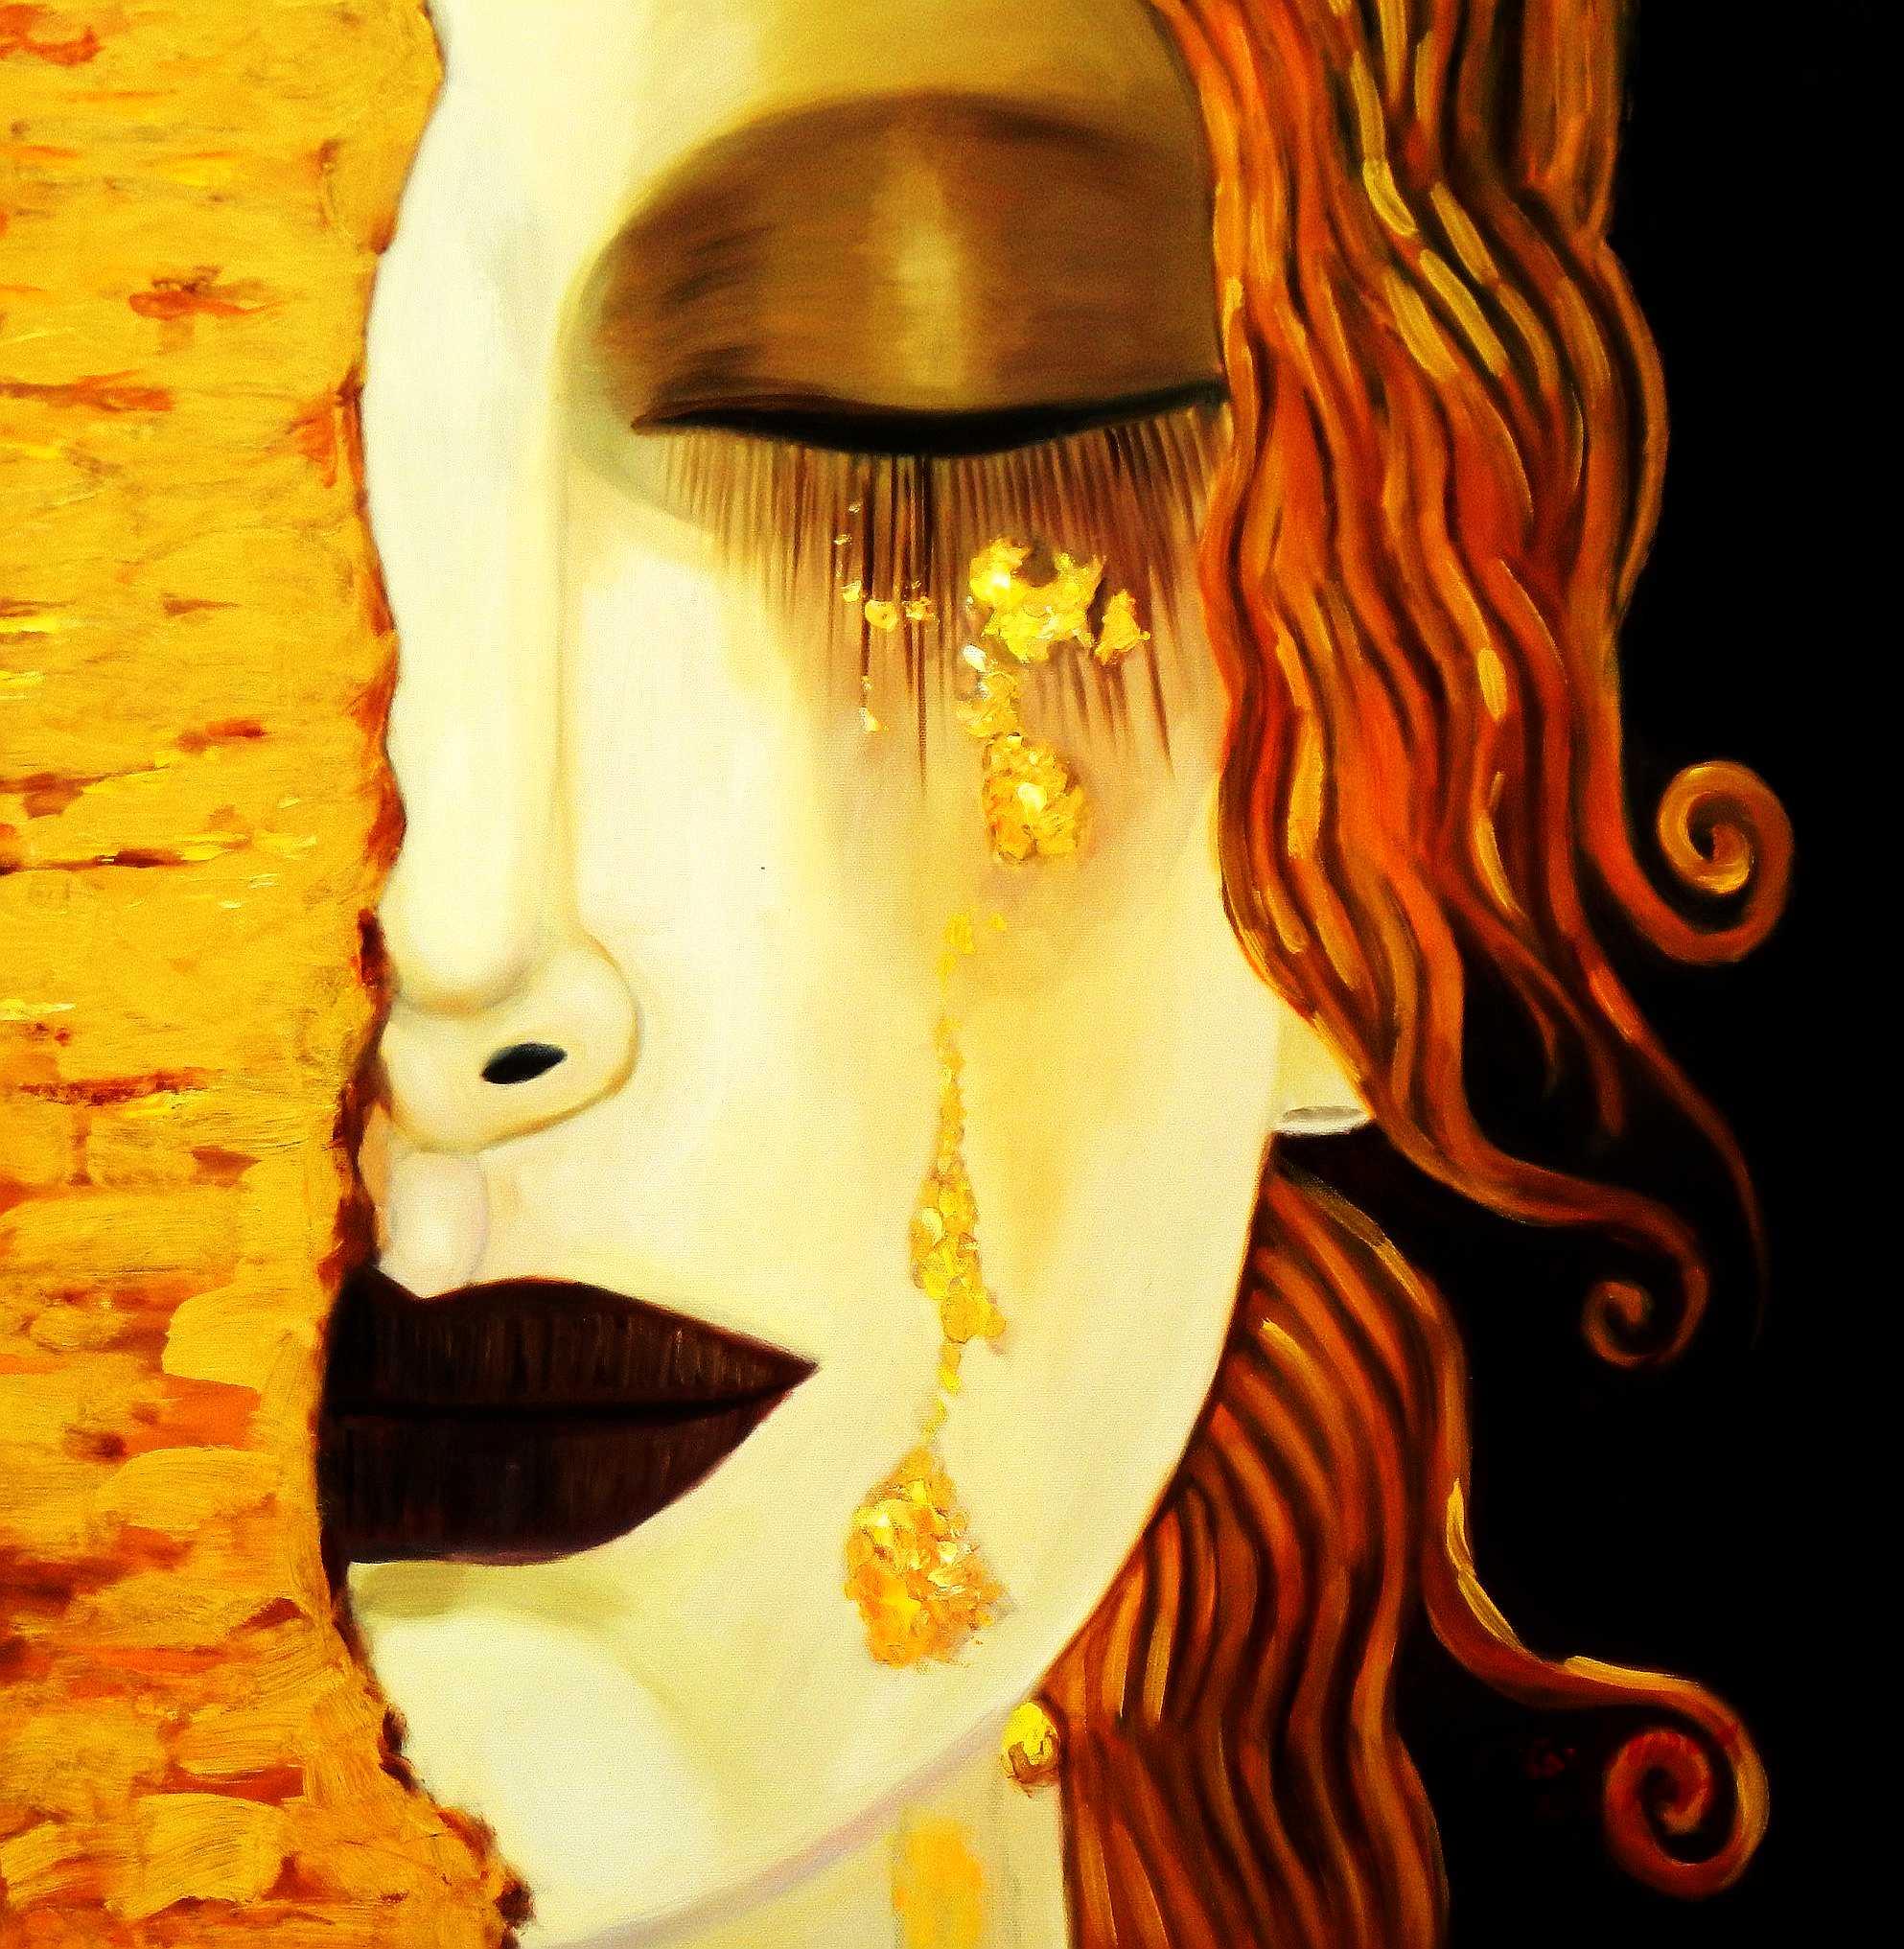 Modern Art - venetian crying e95209 60x60cm beeindruckendes Ölbild